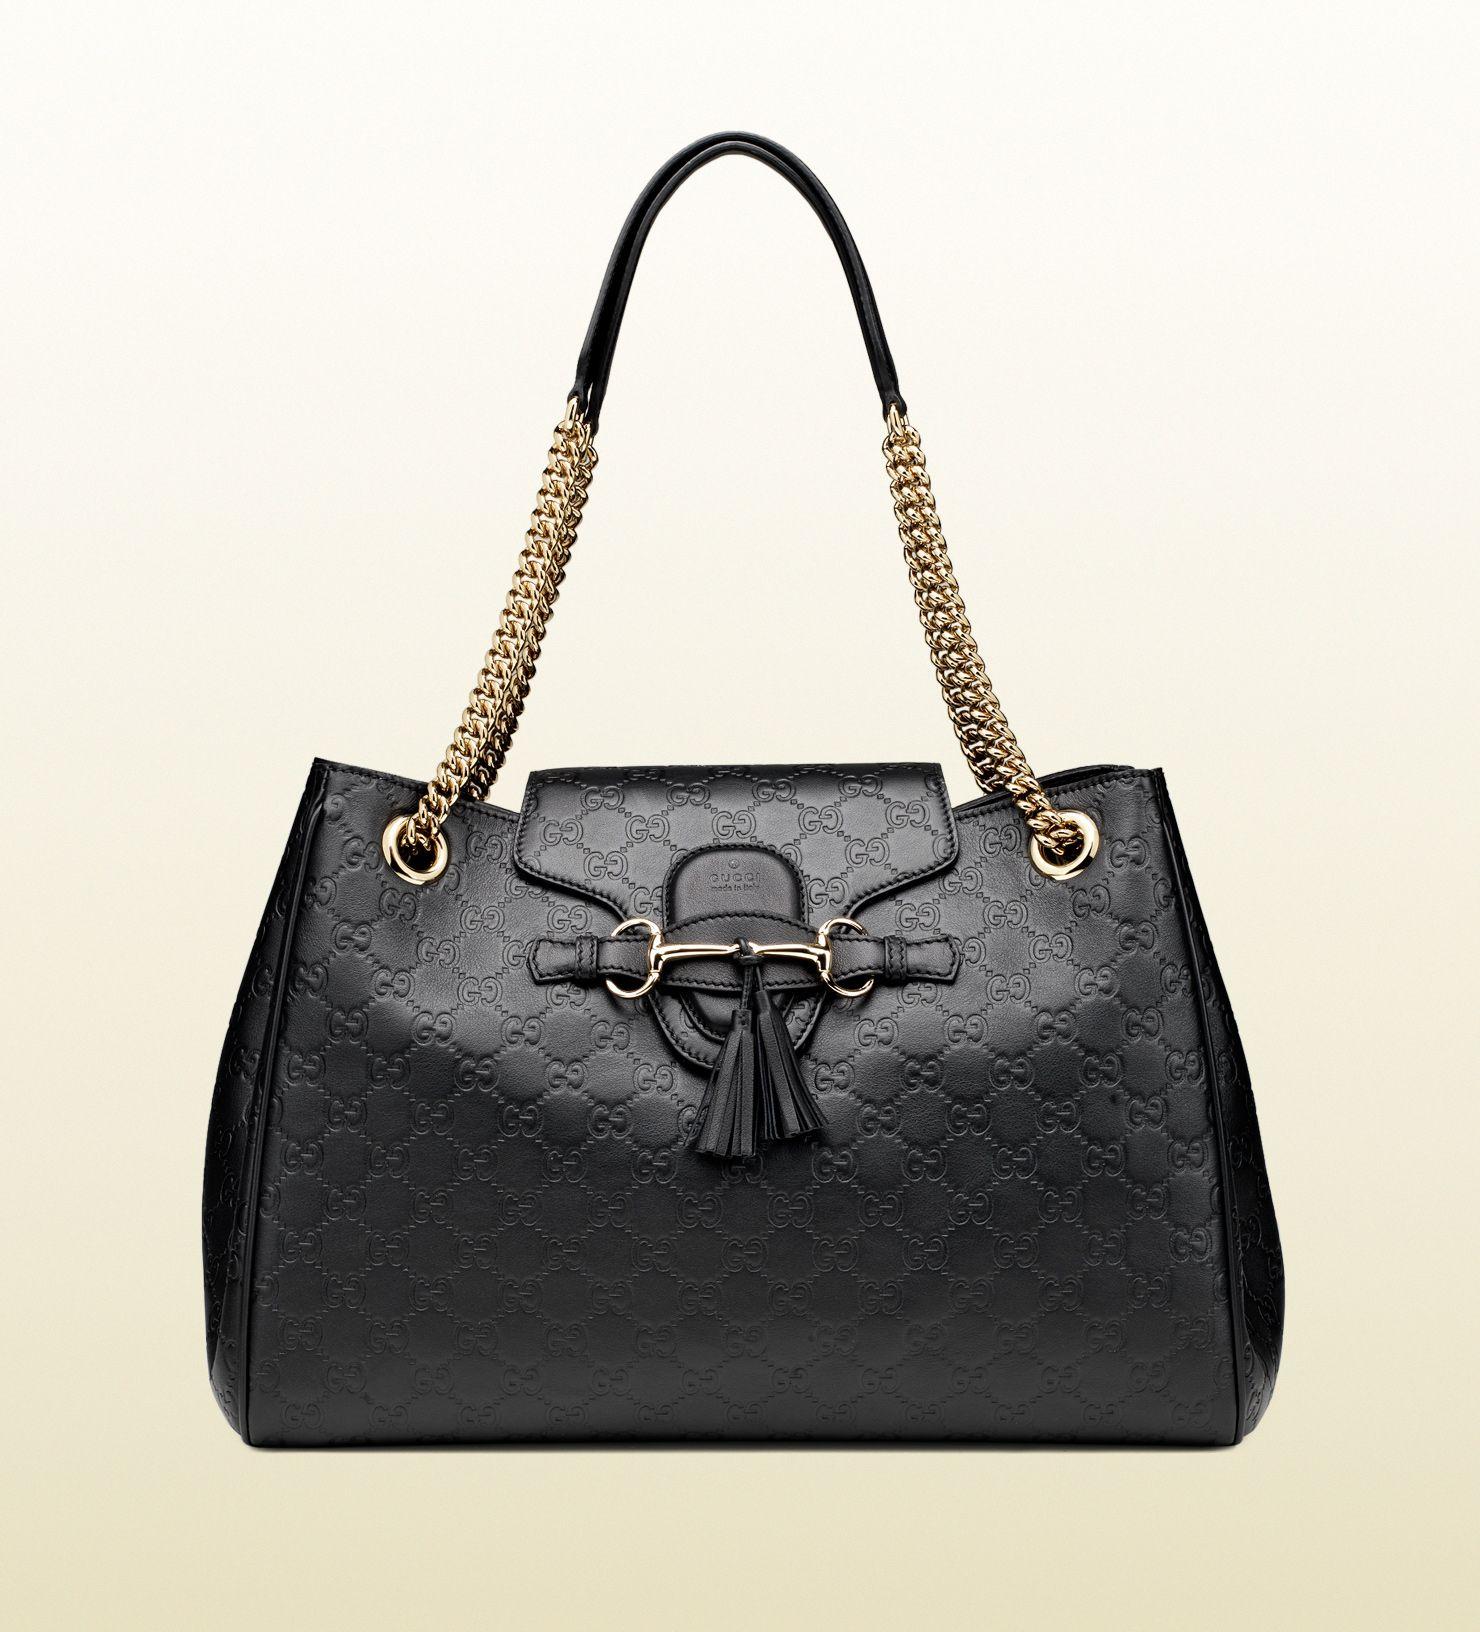 d3a1f1930b0f Gucci - emily guccissima leather shoulder bag 336757AA61Y1000 ...